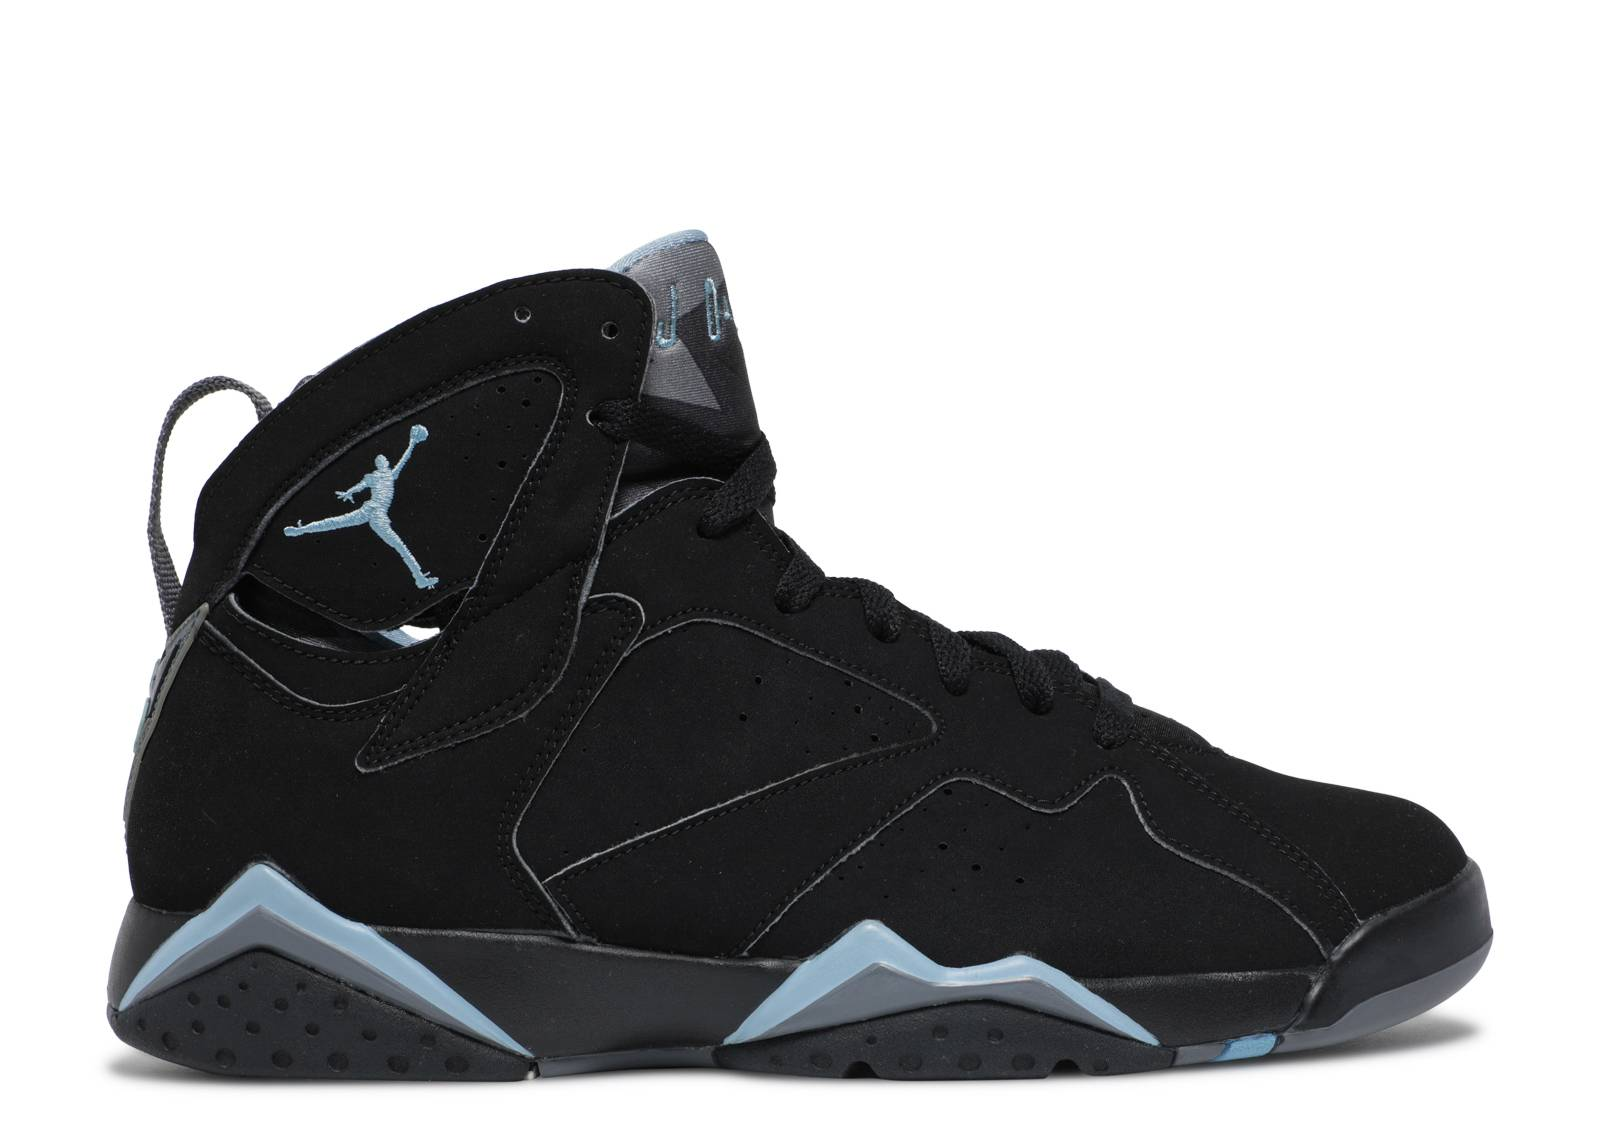 Jordan 7 Black And White